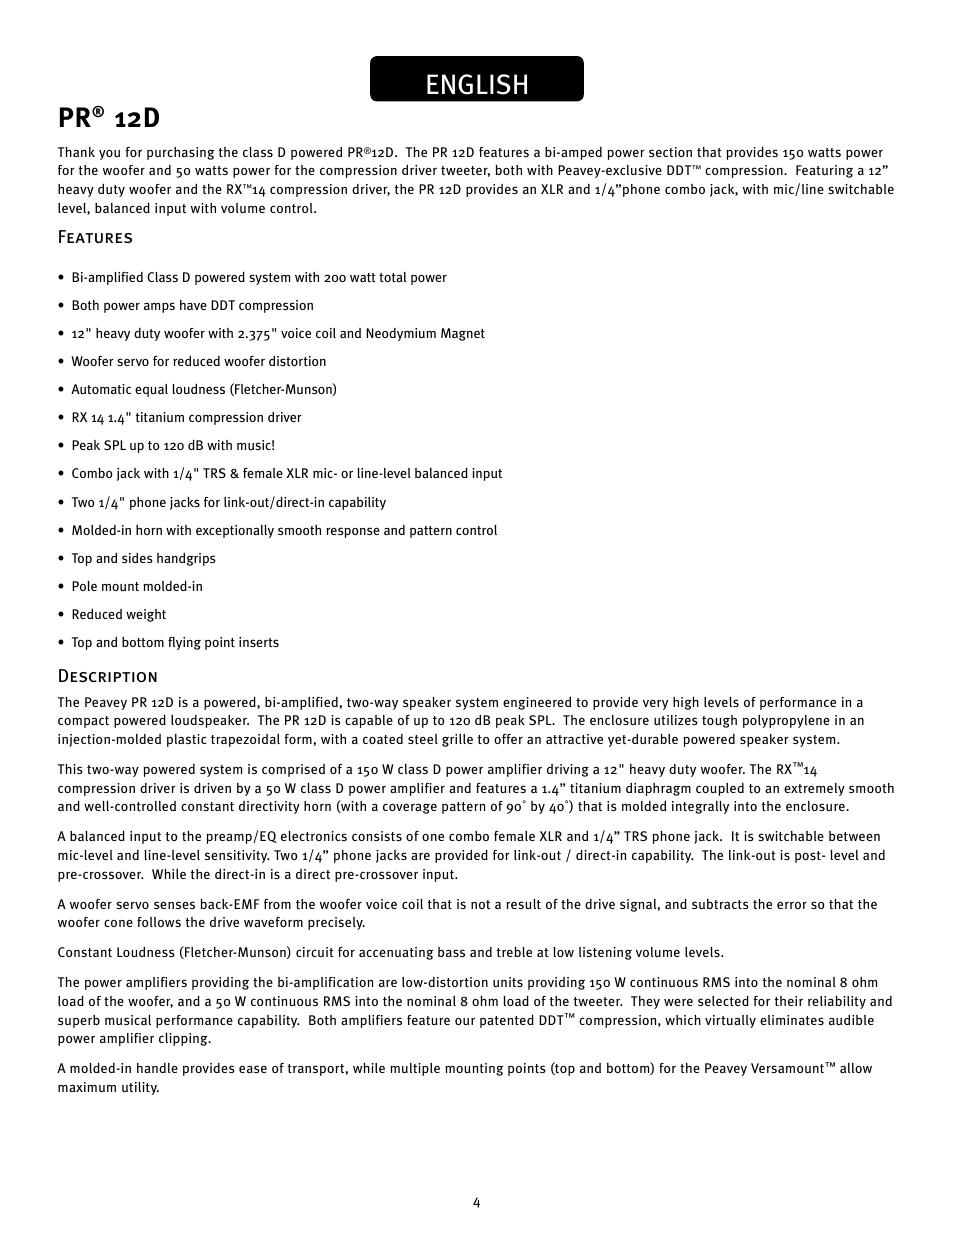 English   Peavey PR 12 D User Manual   Page 4 / 16